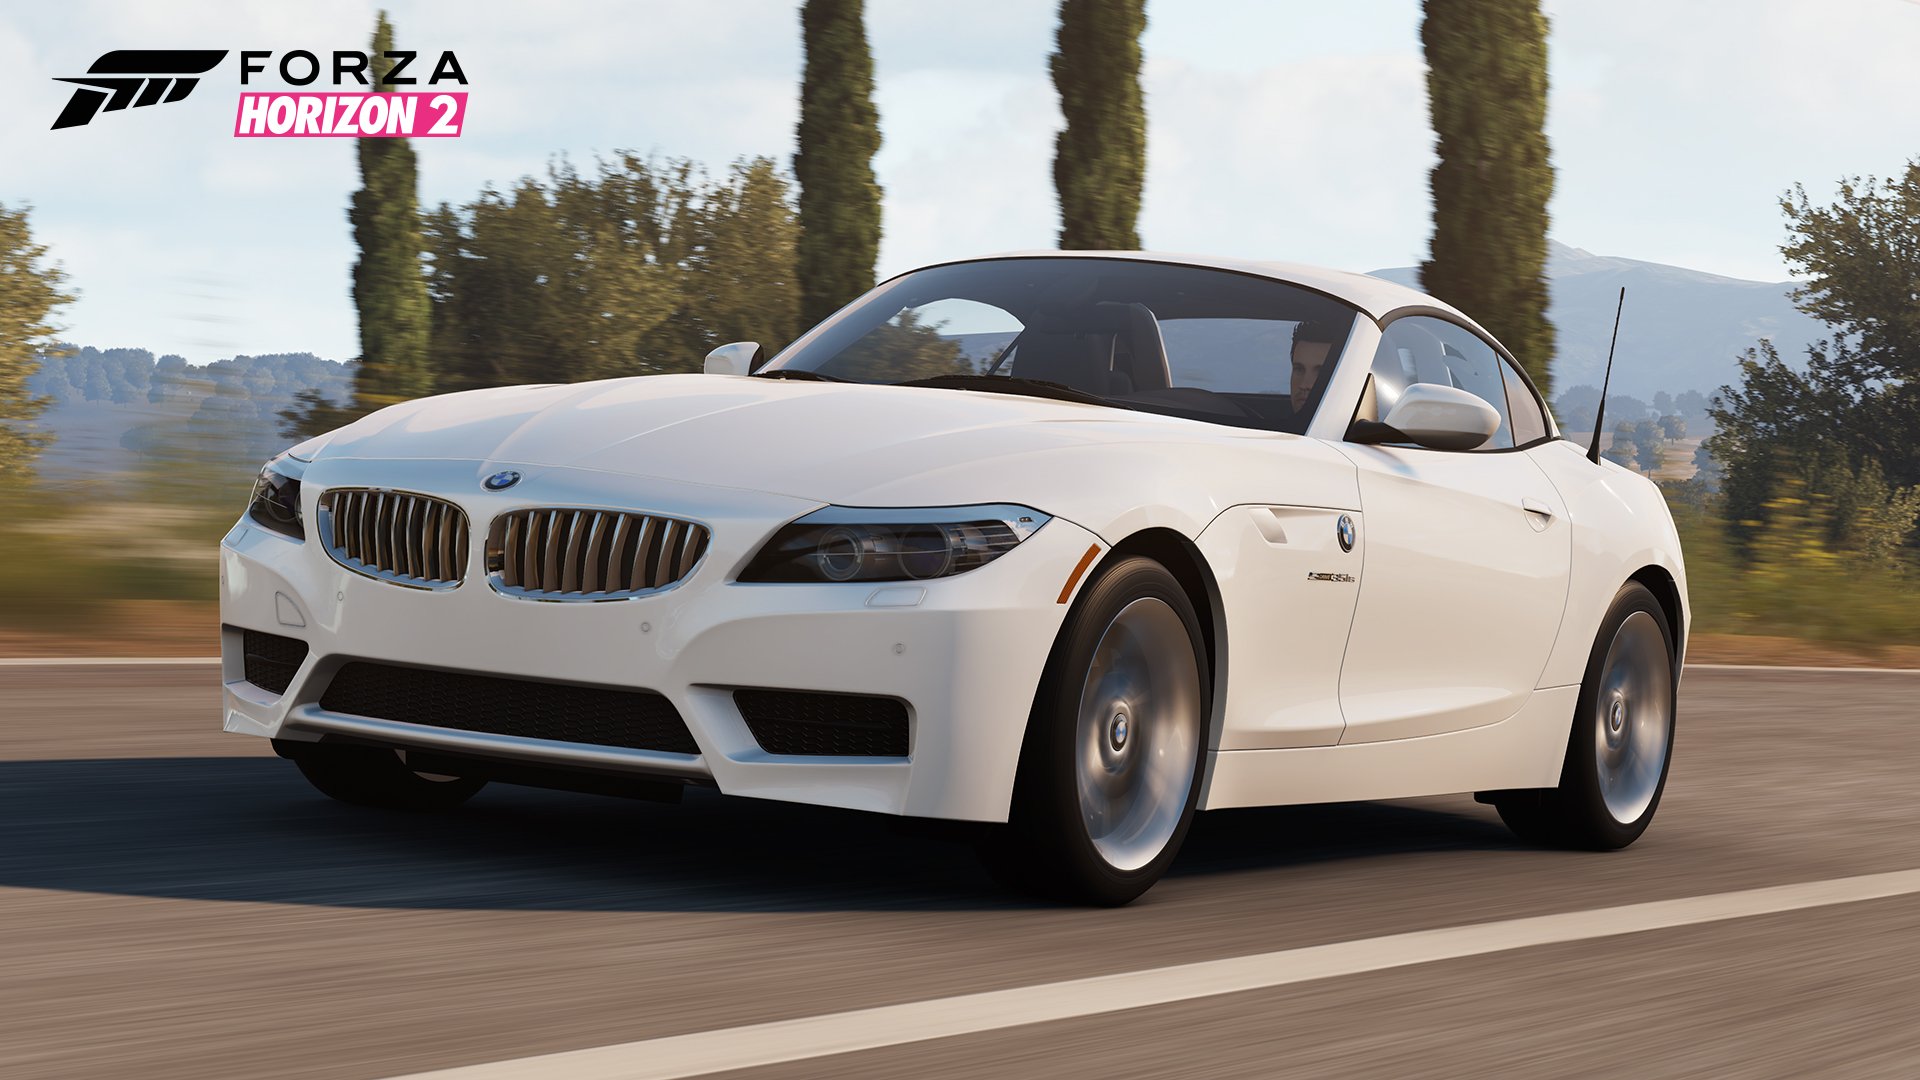 Best Starter Car Forza